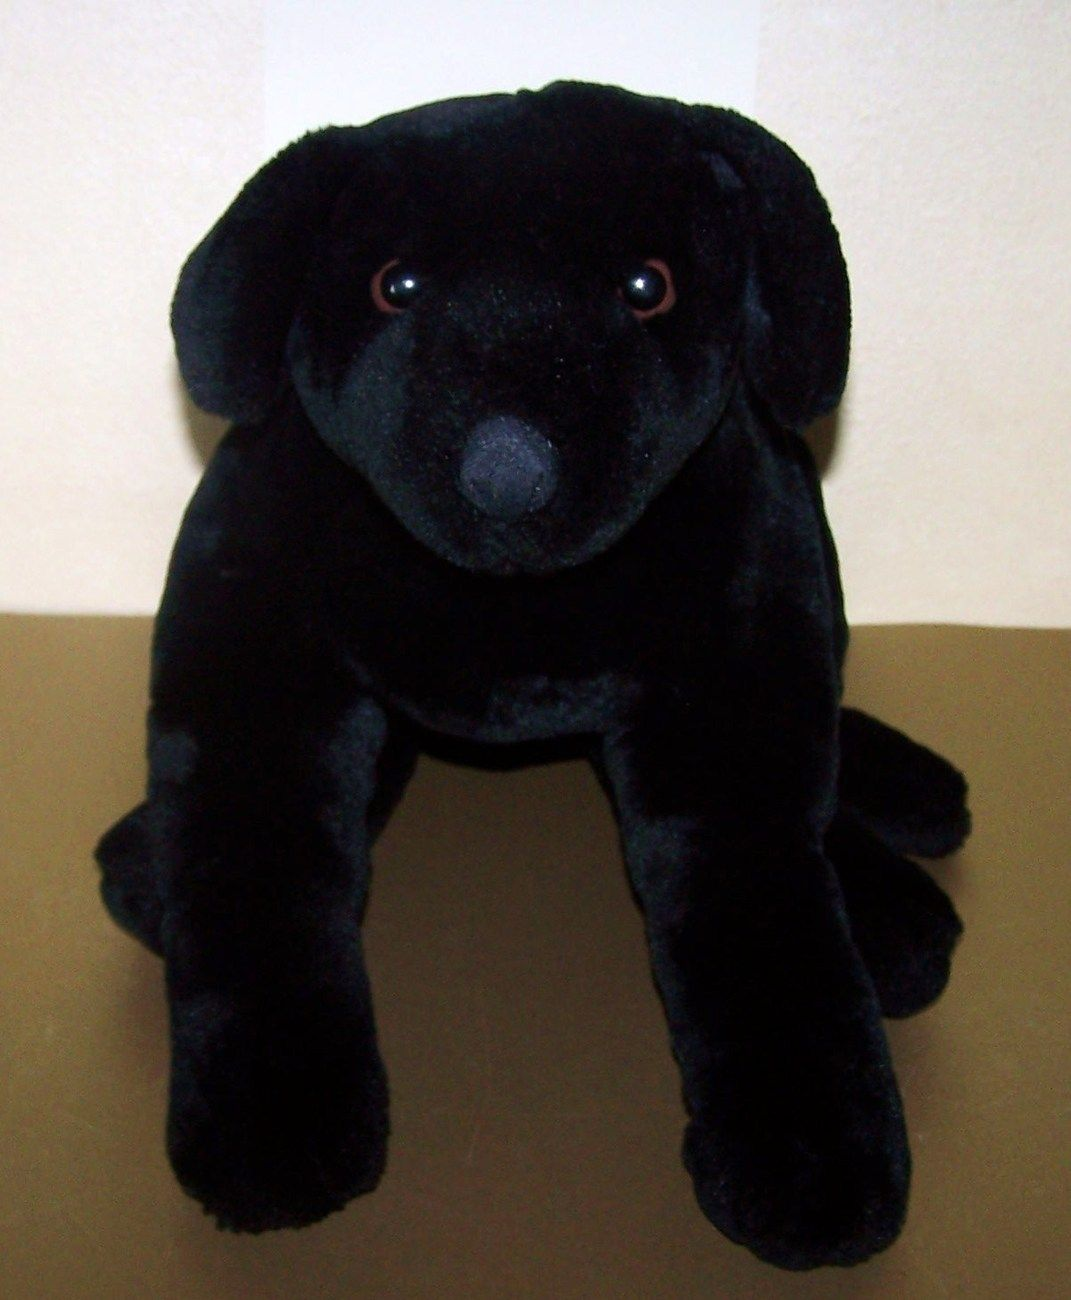 Large Black Labrador Plush Puppy Dog Stuffed Animal 12 00 Stuffed